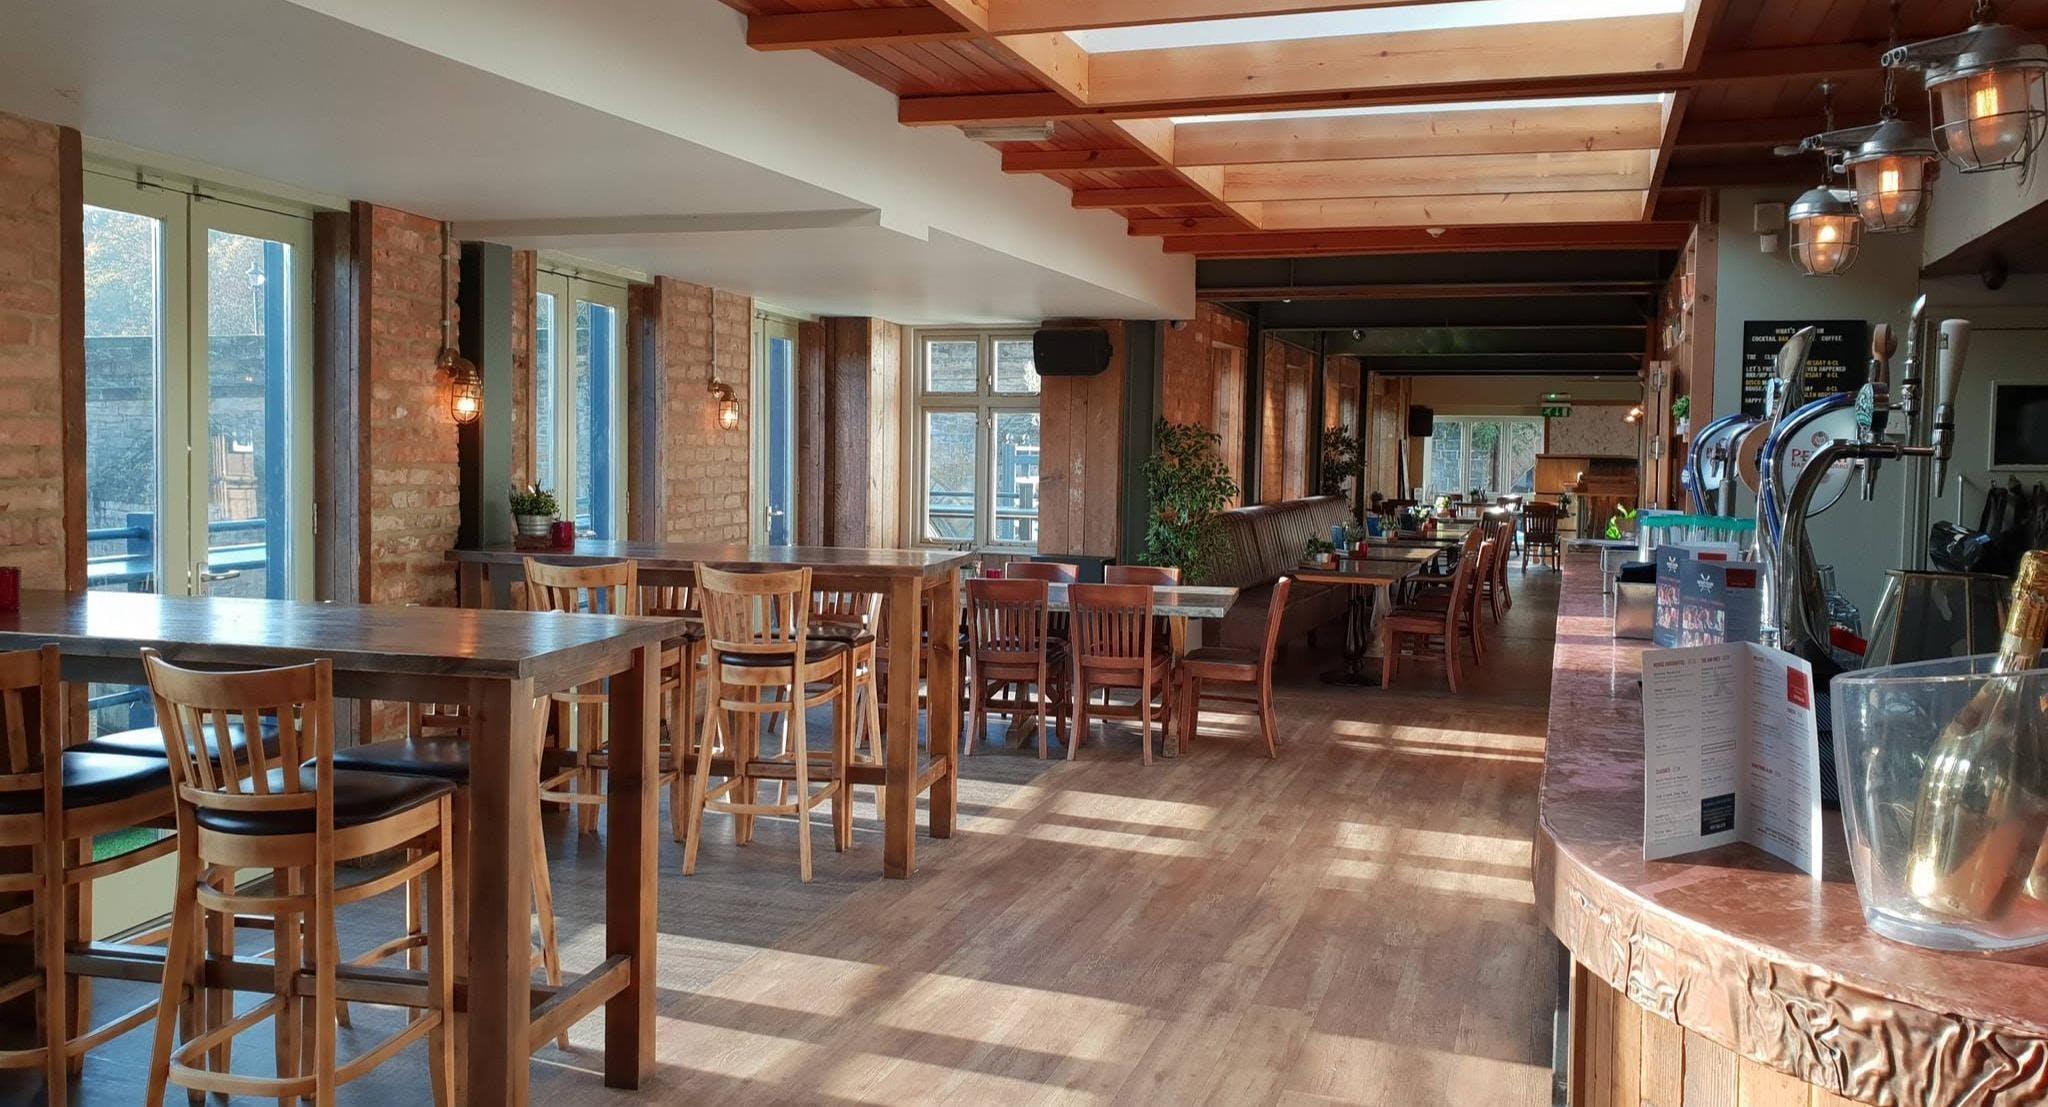 The Boat Club Durham image 3